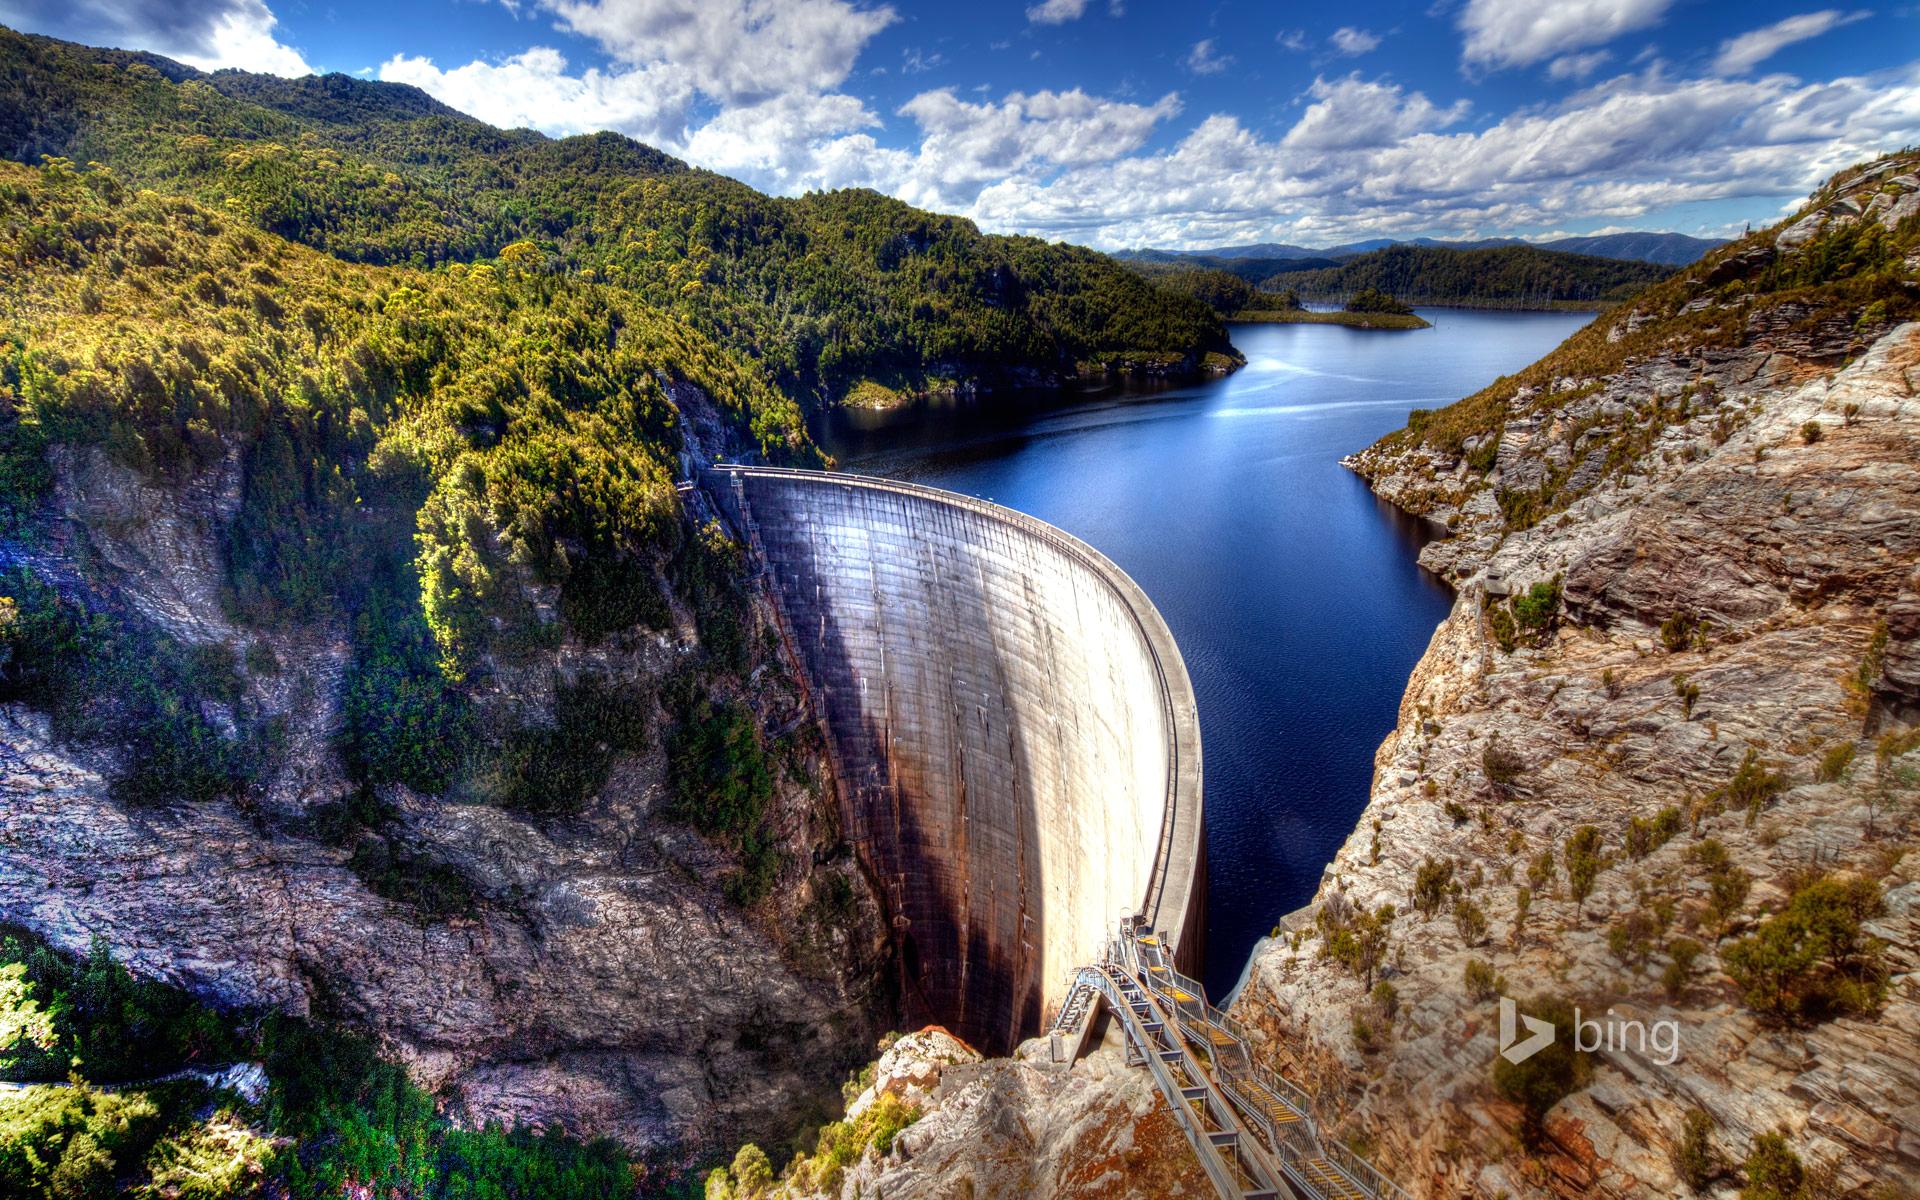 Apple Iphone 5s Wallpaper Hd Download Gordon Dam Tasmania Australia Wallpapers Hd Wallpapers